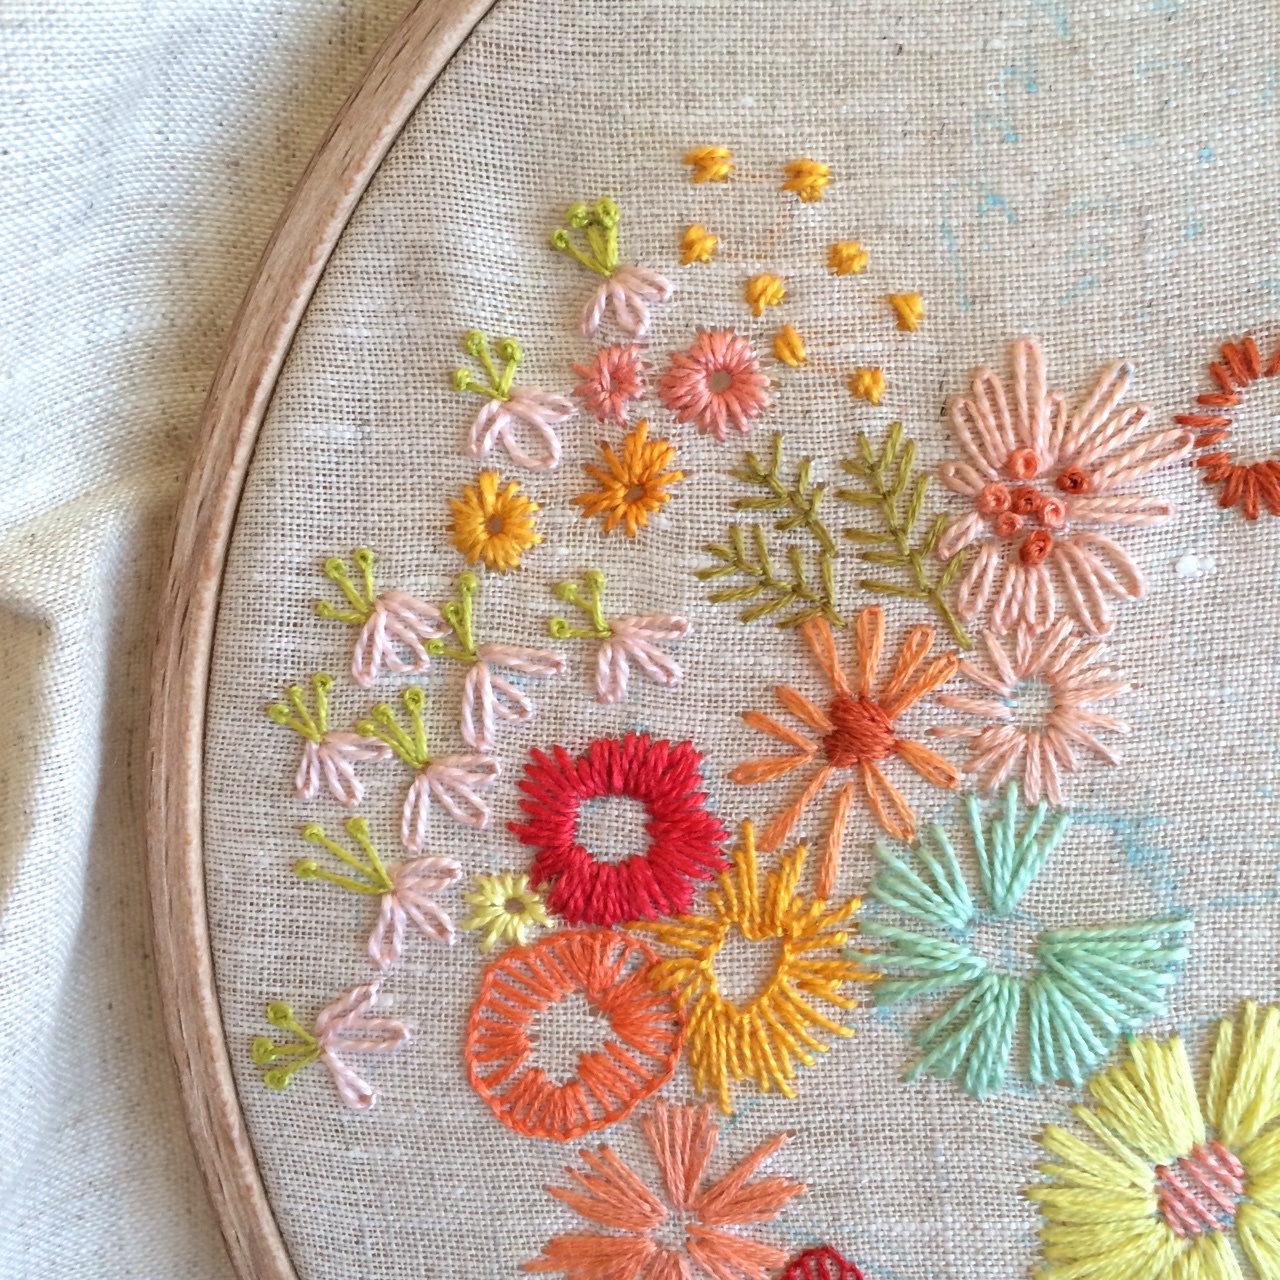 needlework fabric shop and creative workspace in hamilton ontario rh iloveneedlework com needlework hamilton needlework retailer